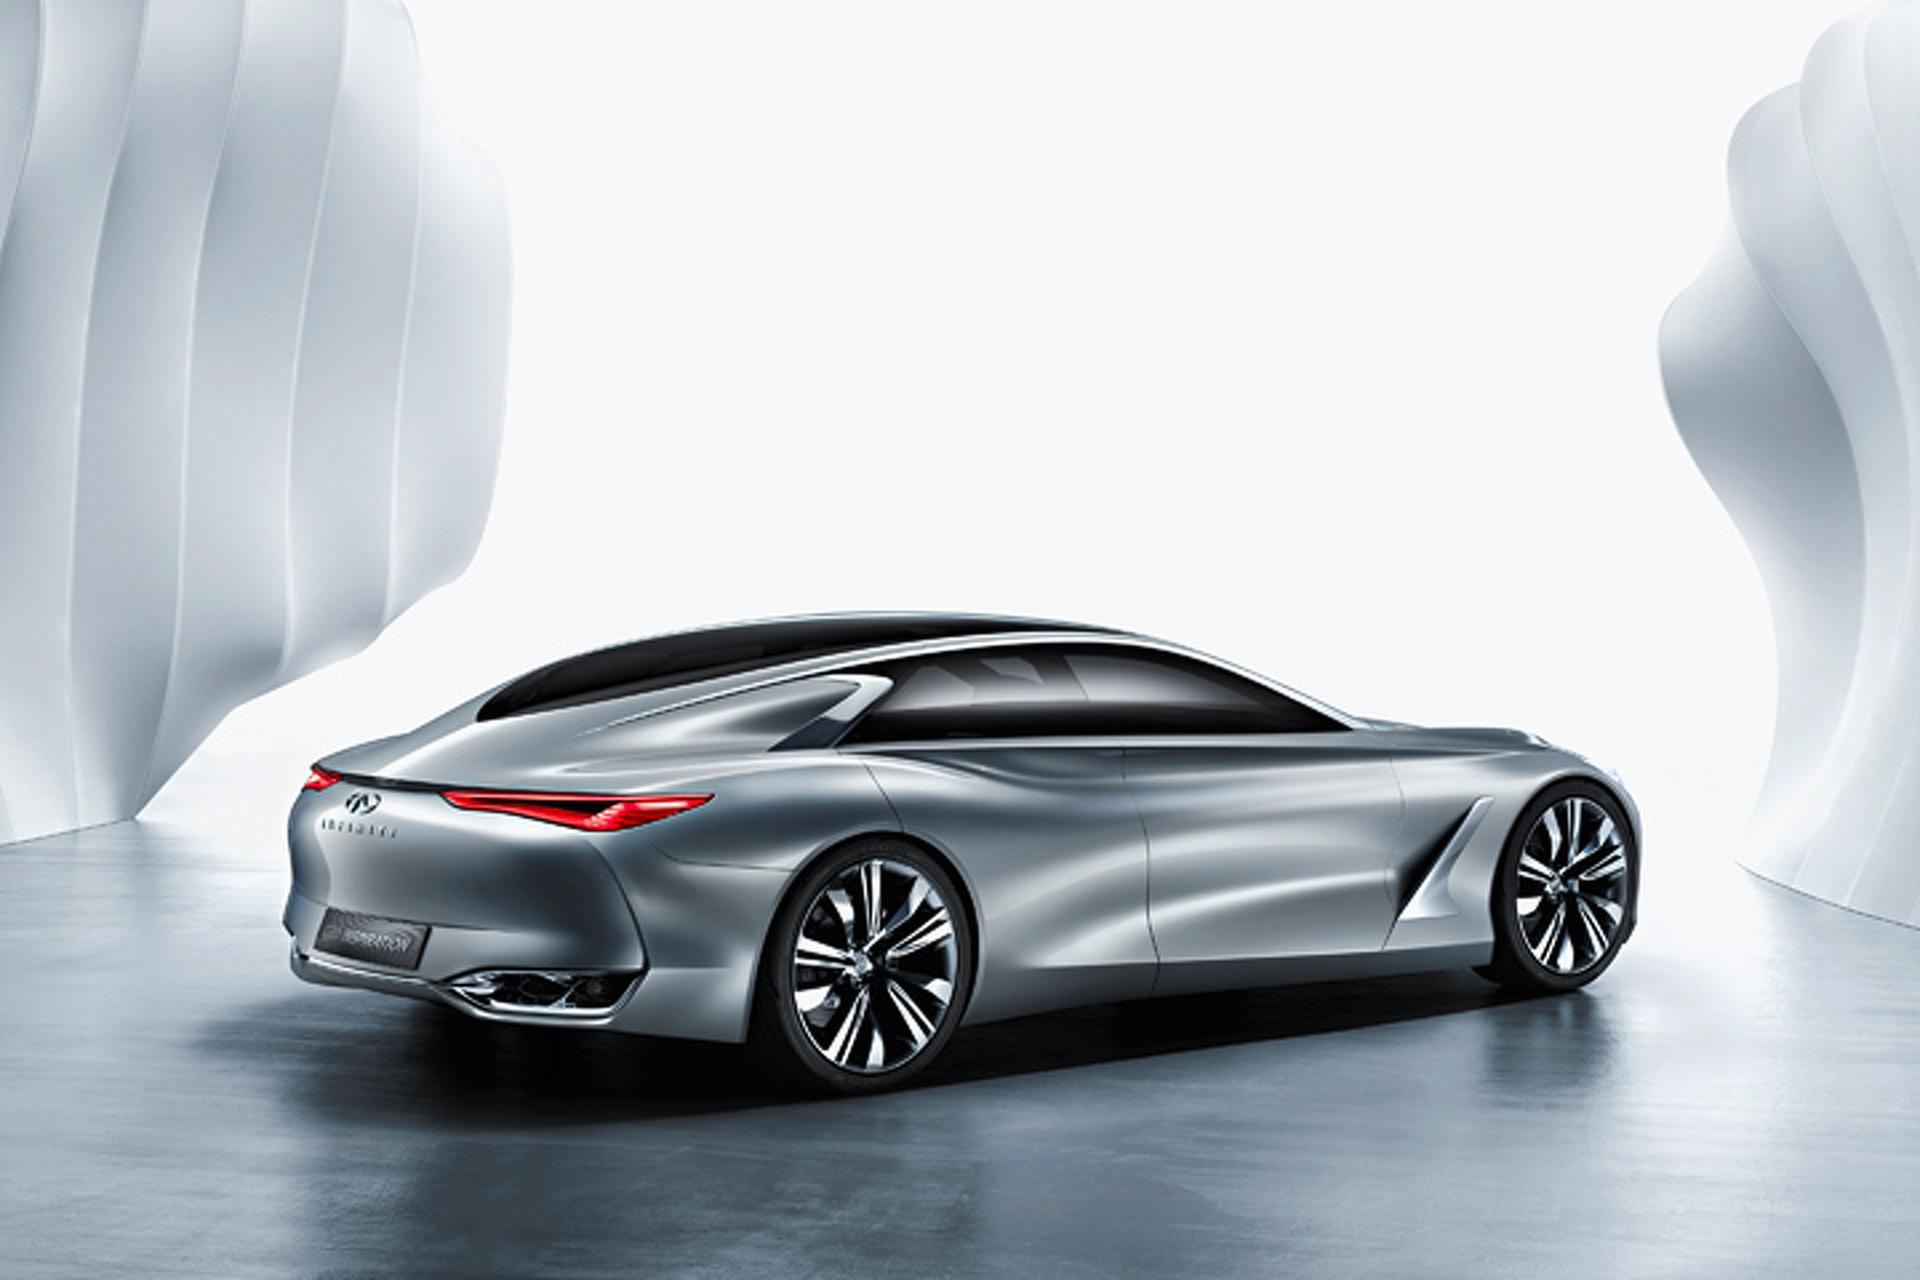 2014 Paris Motor Show's 6 Boldest Reveals